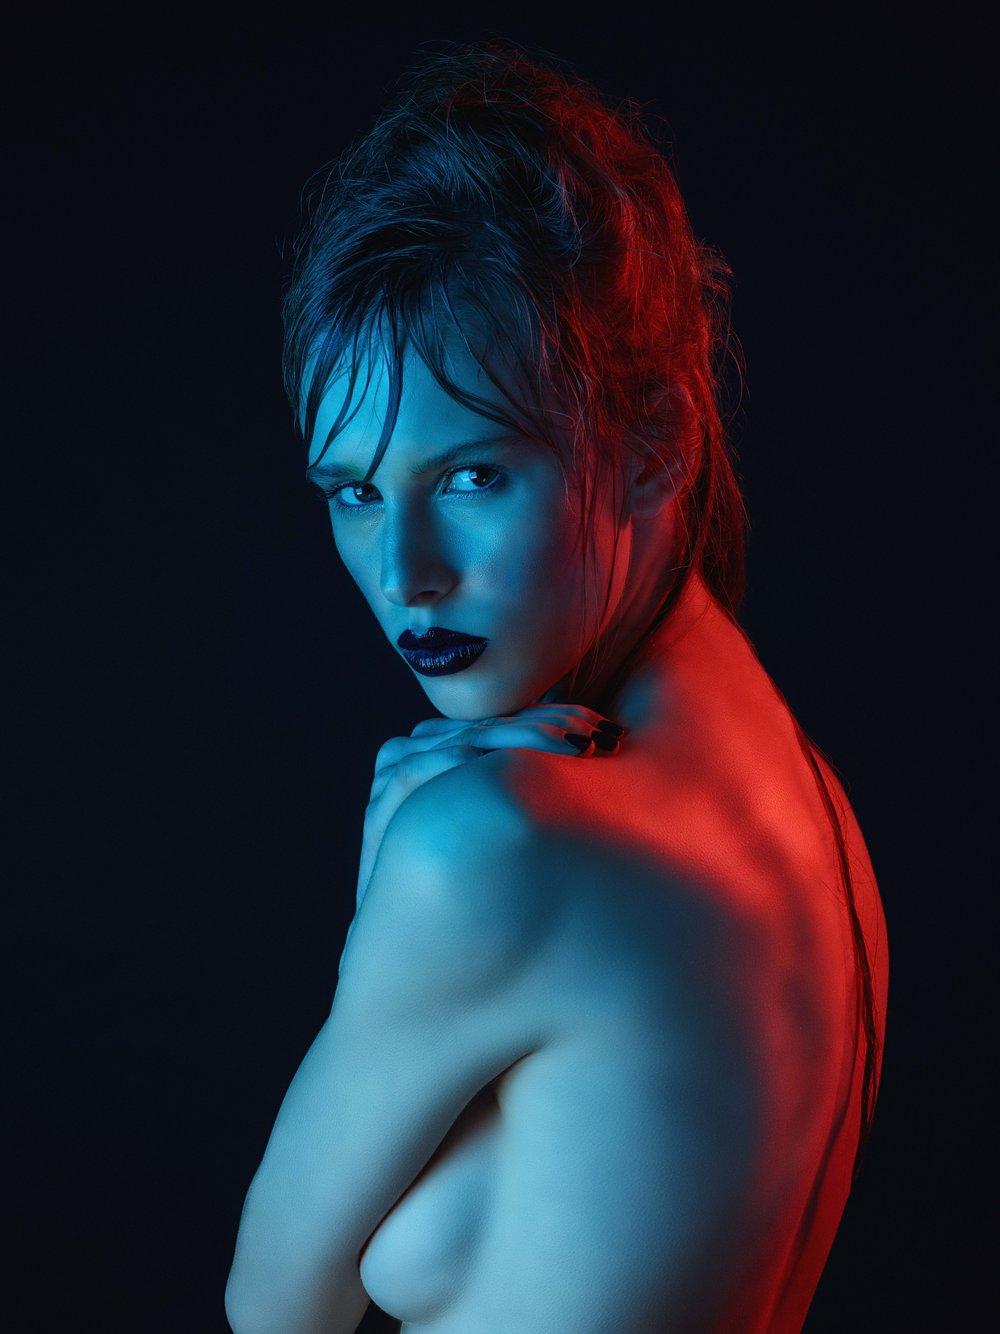 Skin: accord parfait L'oréal Paris, natural finish cream concealer Shiseido Efects blush Christian Dior Eyes: mascara false lash extensions L'oréal Lips: baton Kiko 552, golden gloss YSL